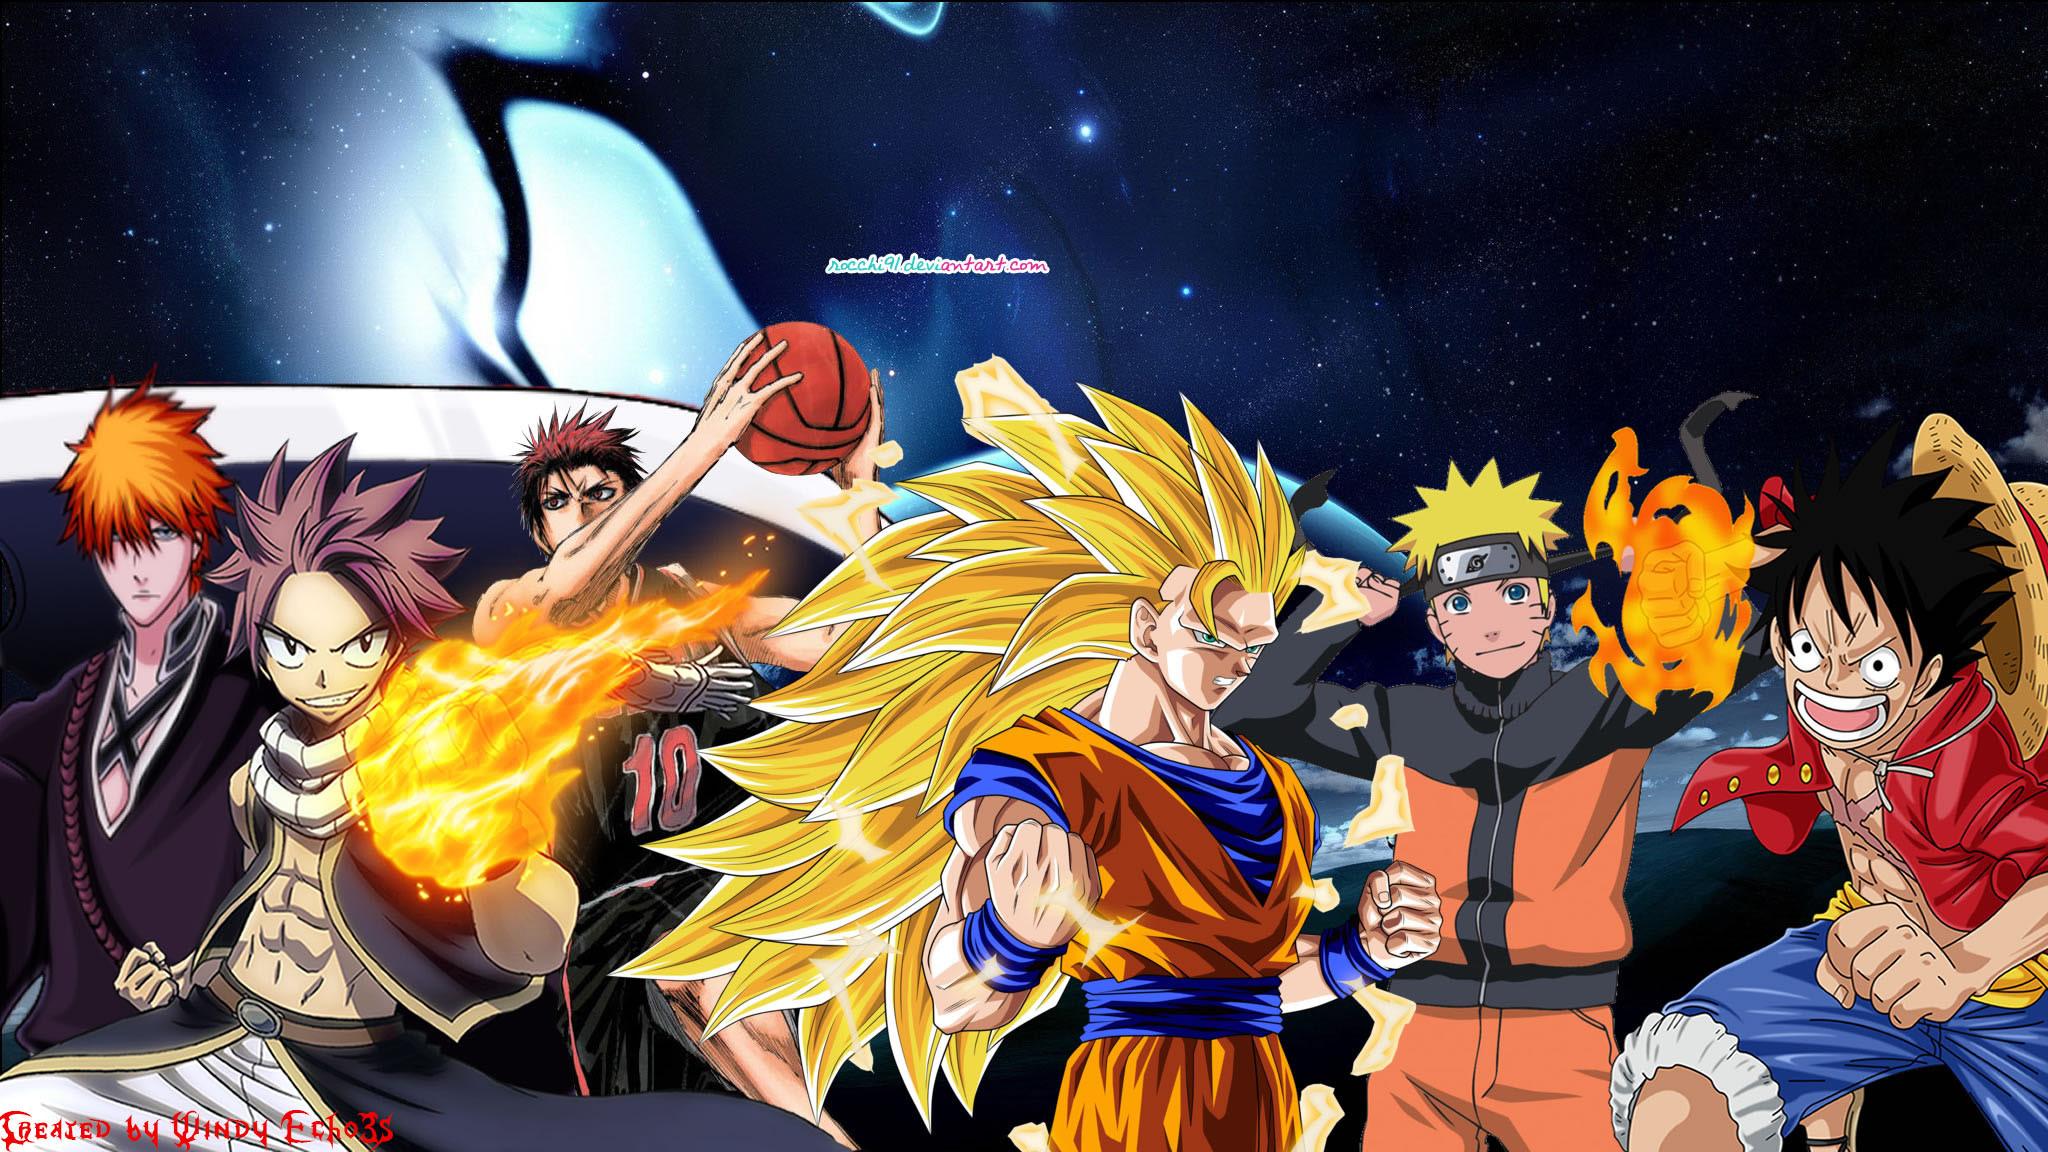 Kuroko basketball wallpaper 66 images - Anime background for youtube ...